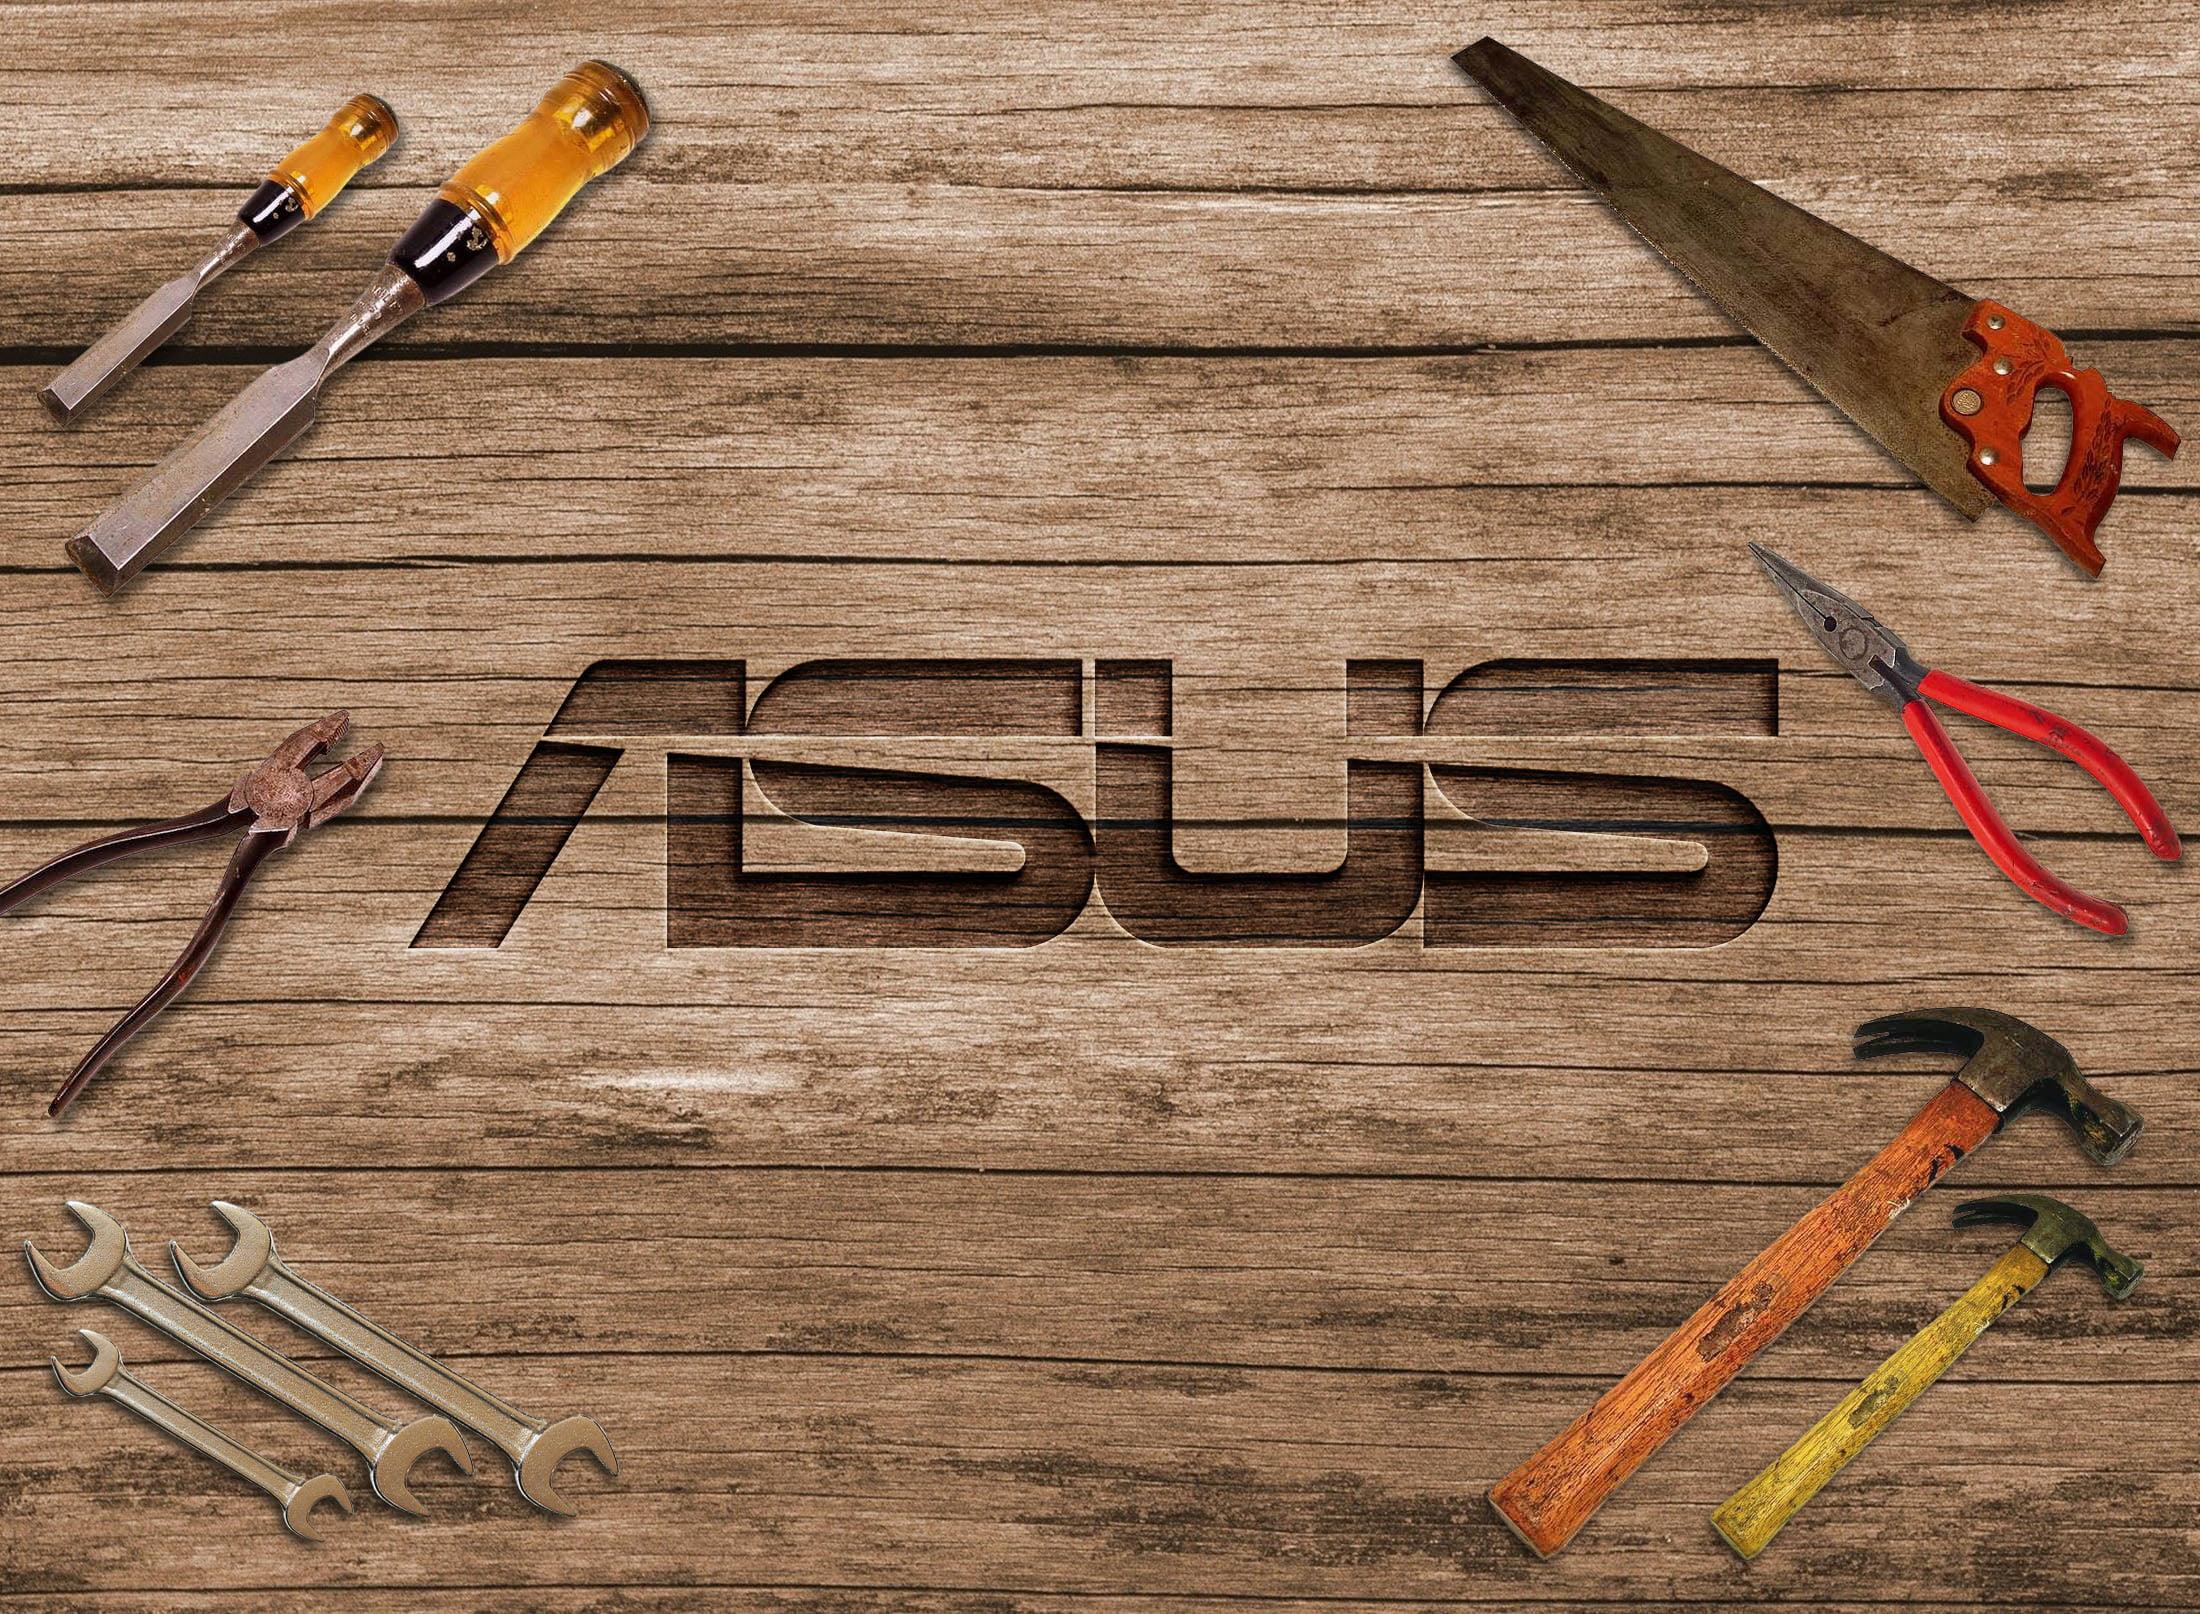 Asus Logo on 3d curved wood mockup